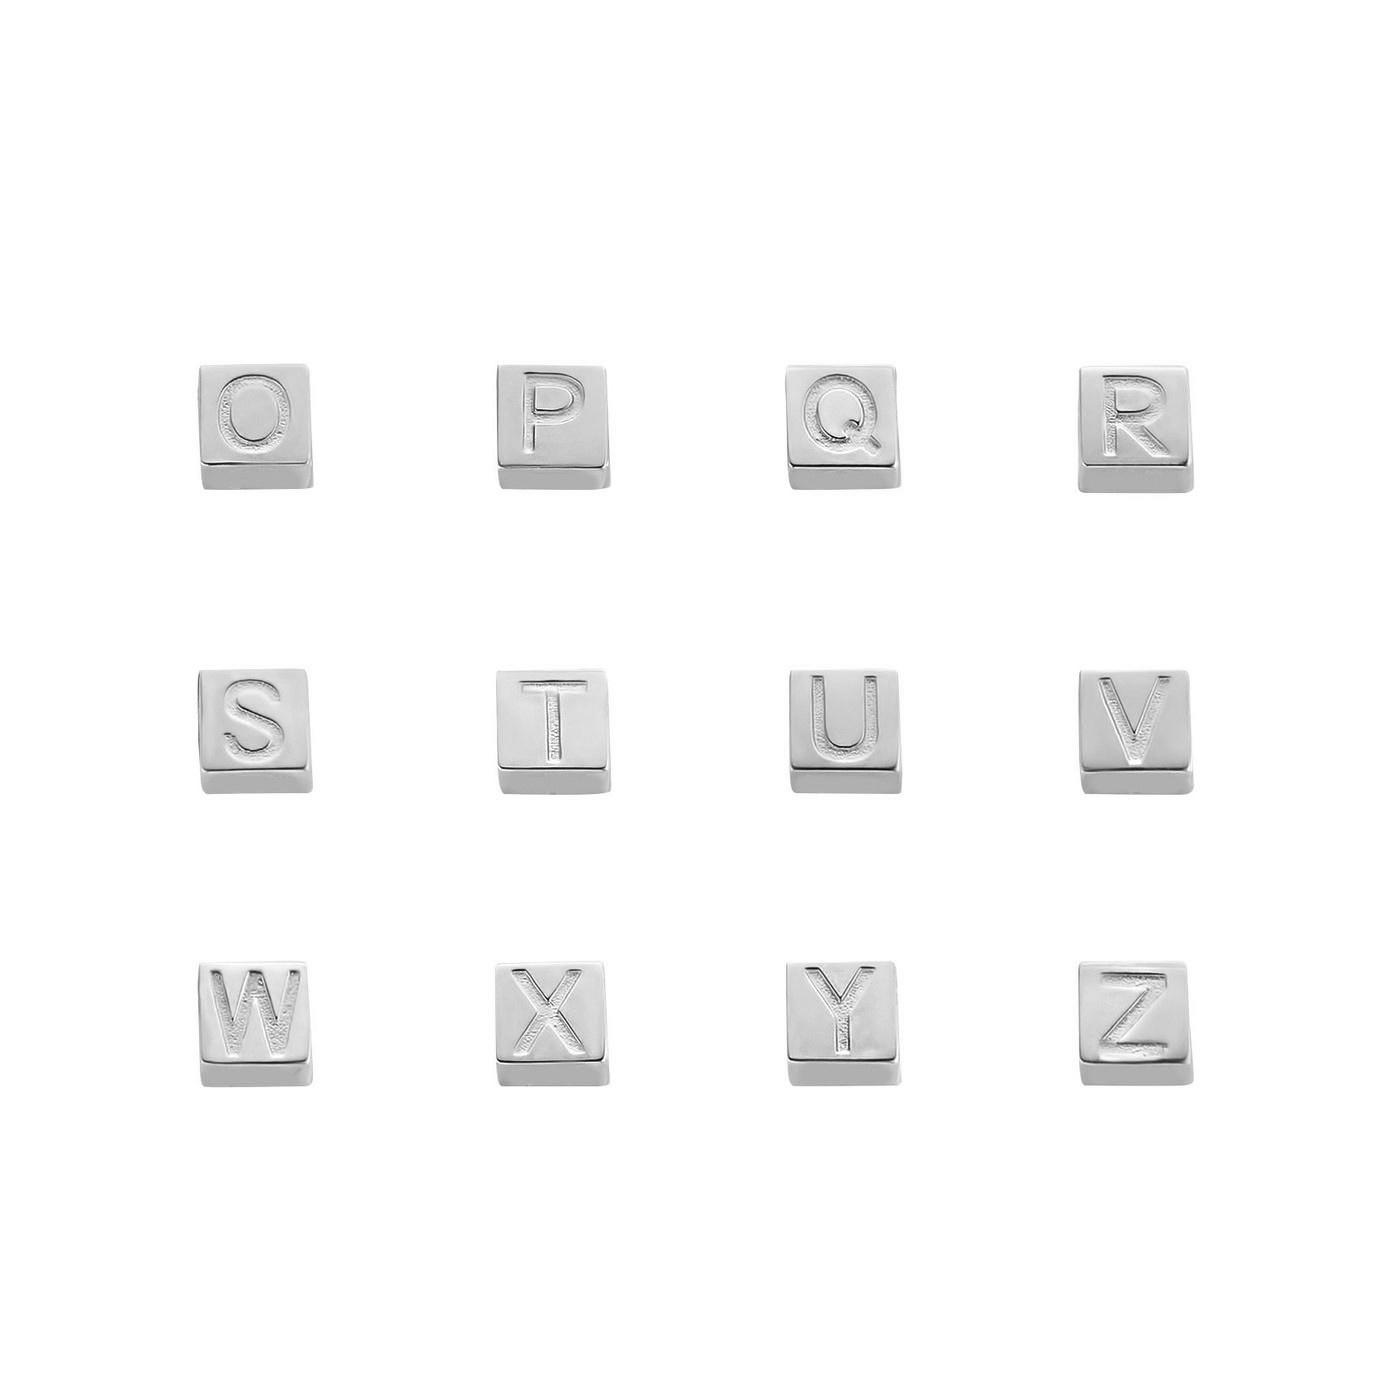 Isabel Bernard Saint Germain Felie 14 karaat witgouden kubus initial bedel met letter